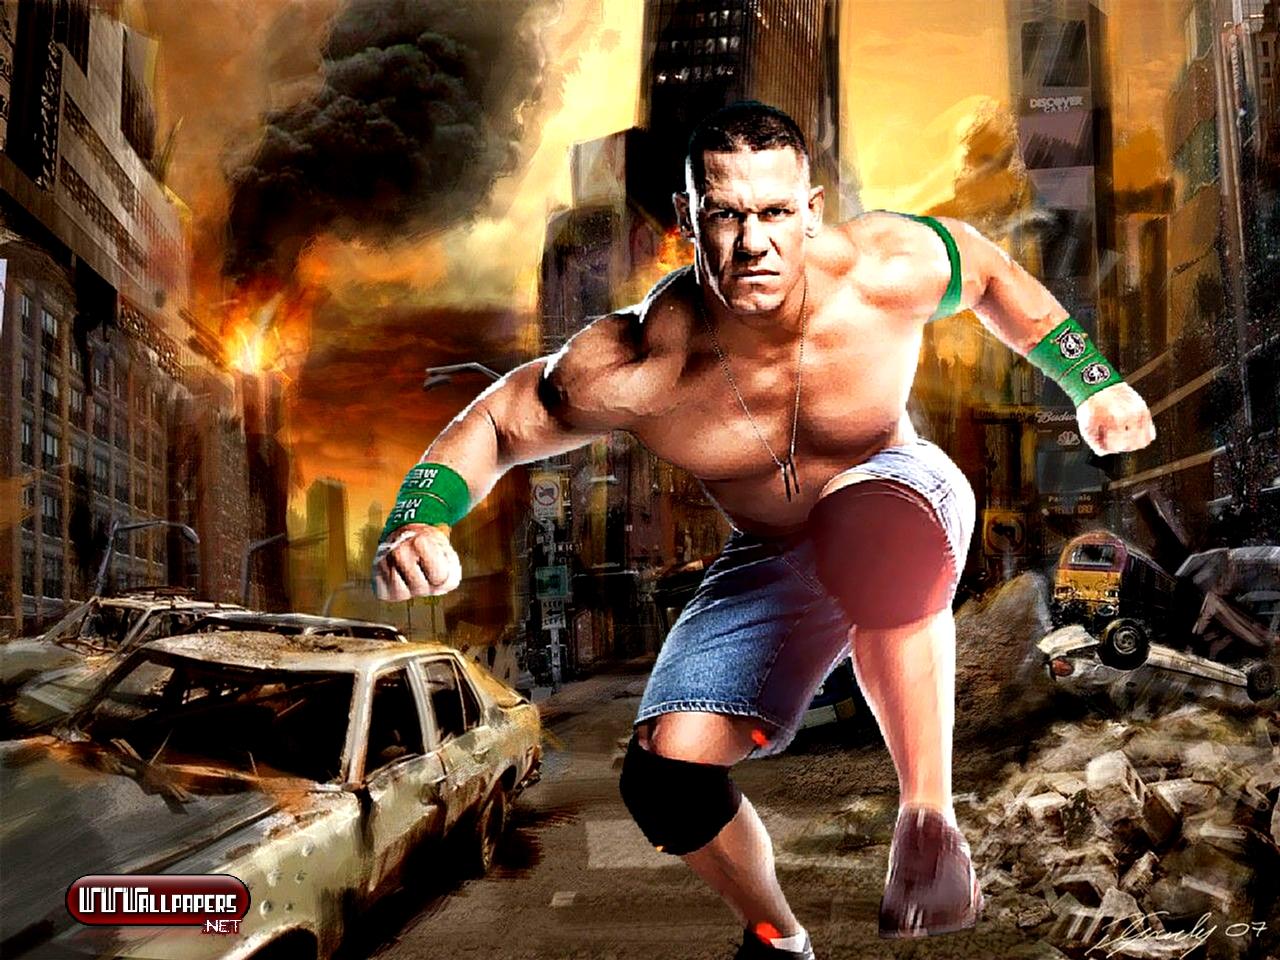 3d Wallpaper Mobile Apps John Cena Wwe Wallpapers Hd The Nology